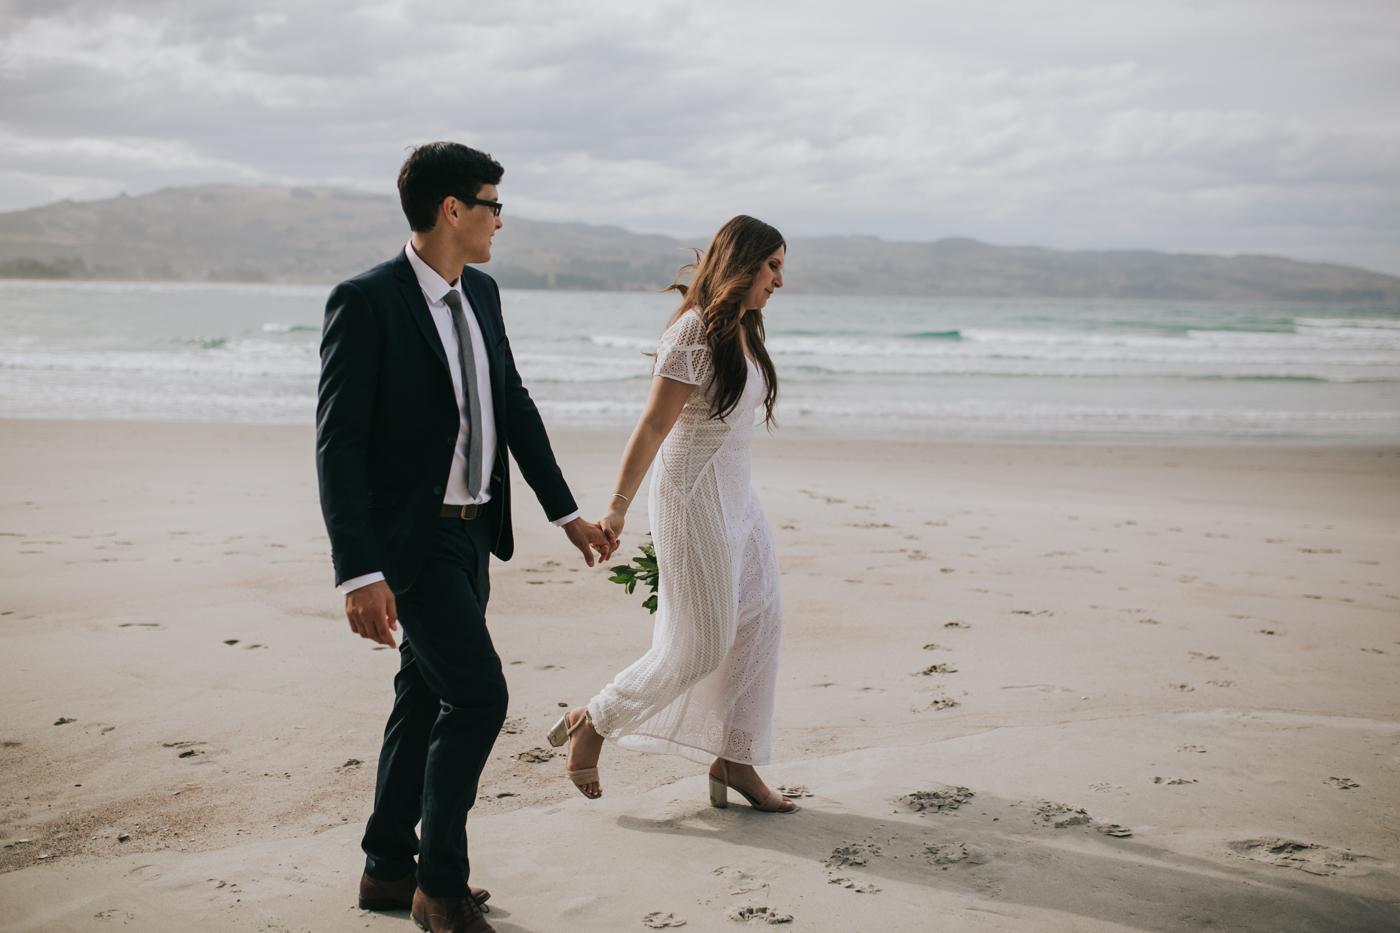 Ariana & Tim - Dunedin, New Zealand Wedding - Destination Wedding - Samantha Heather Photography-163.jpg